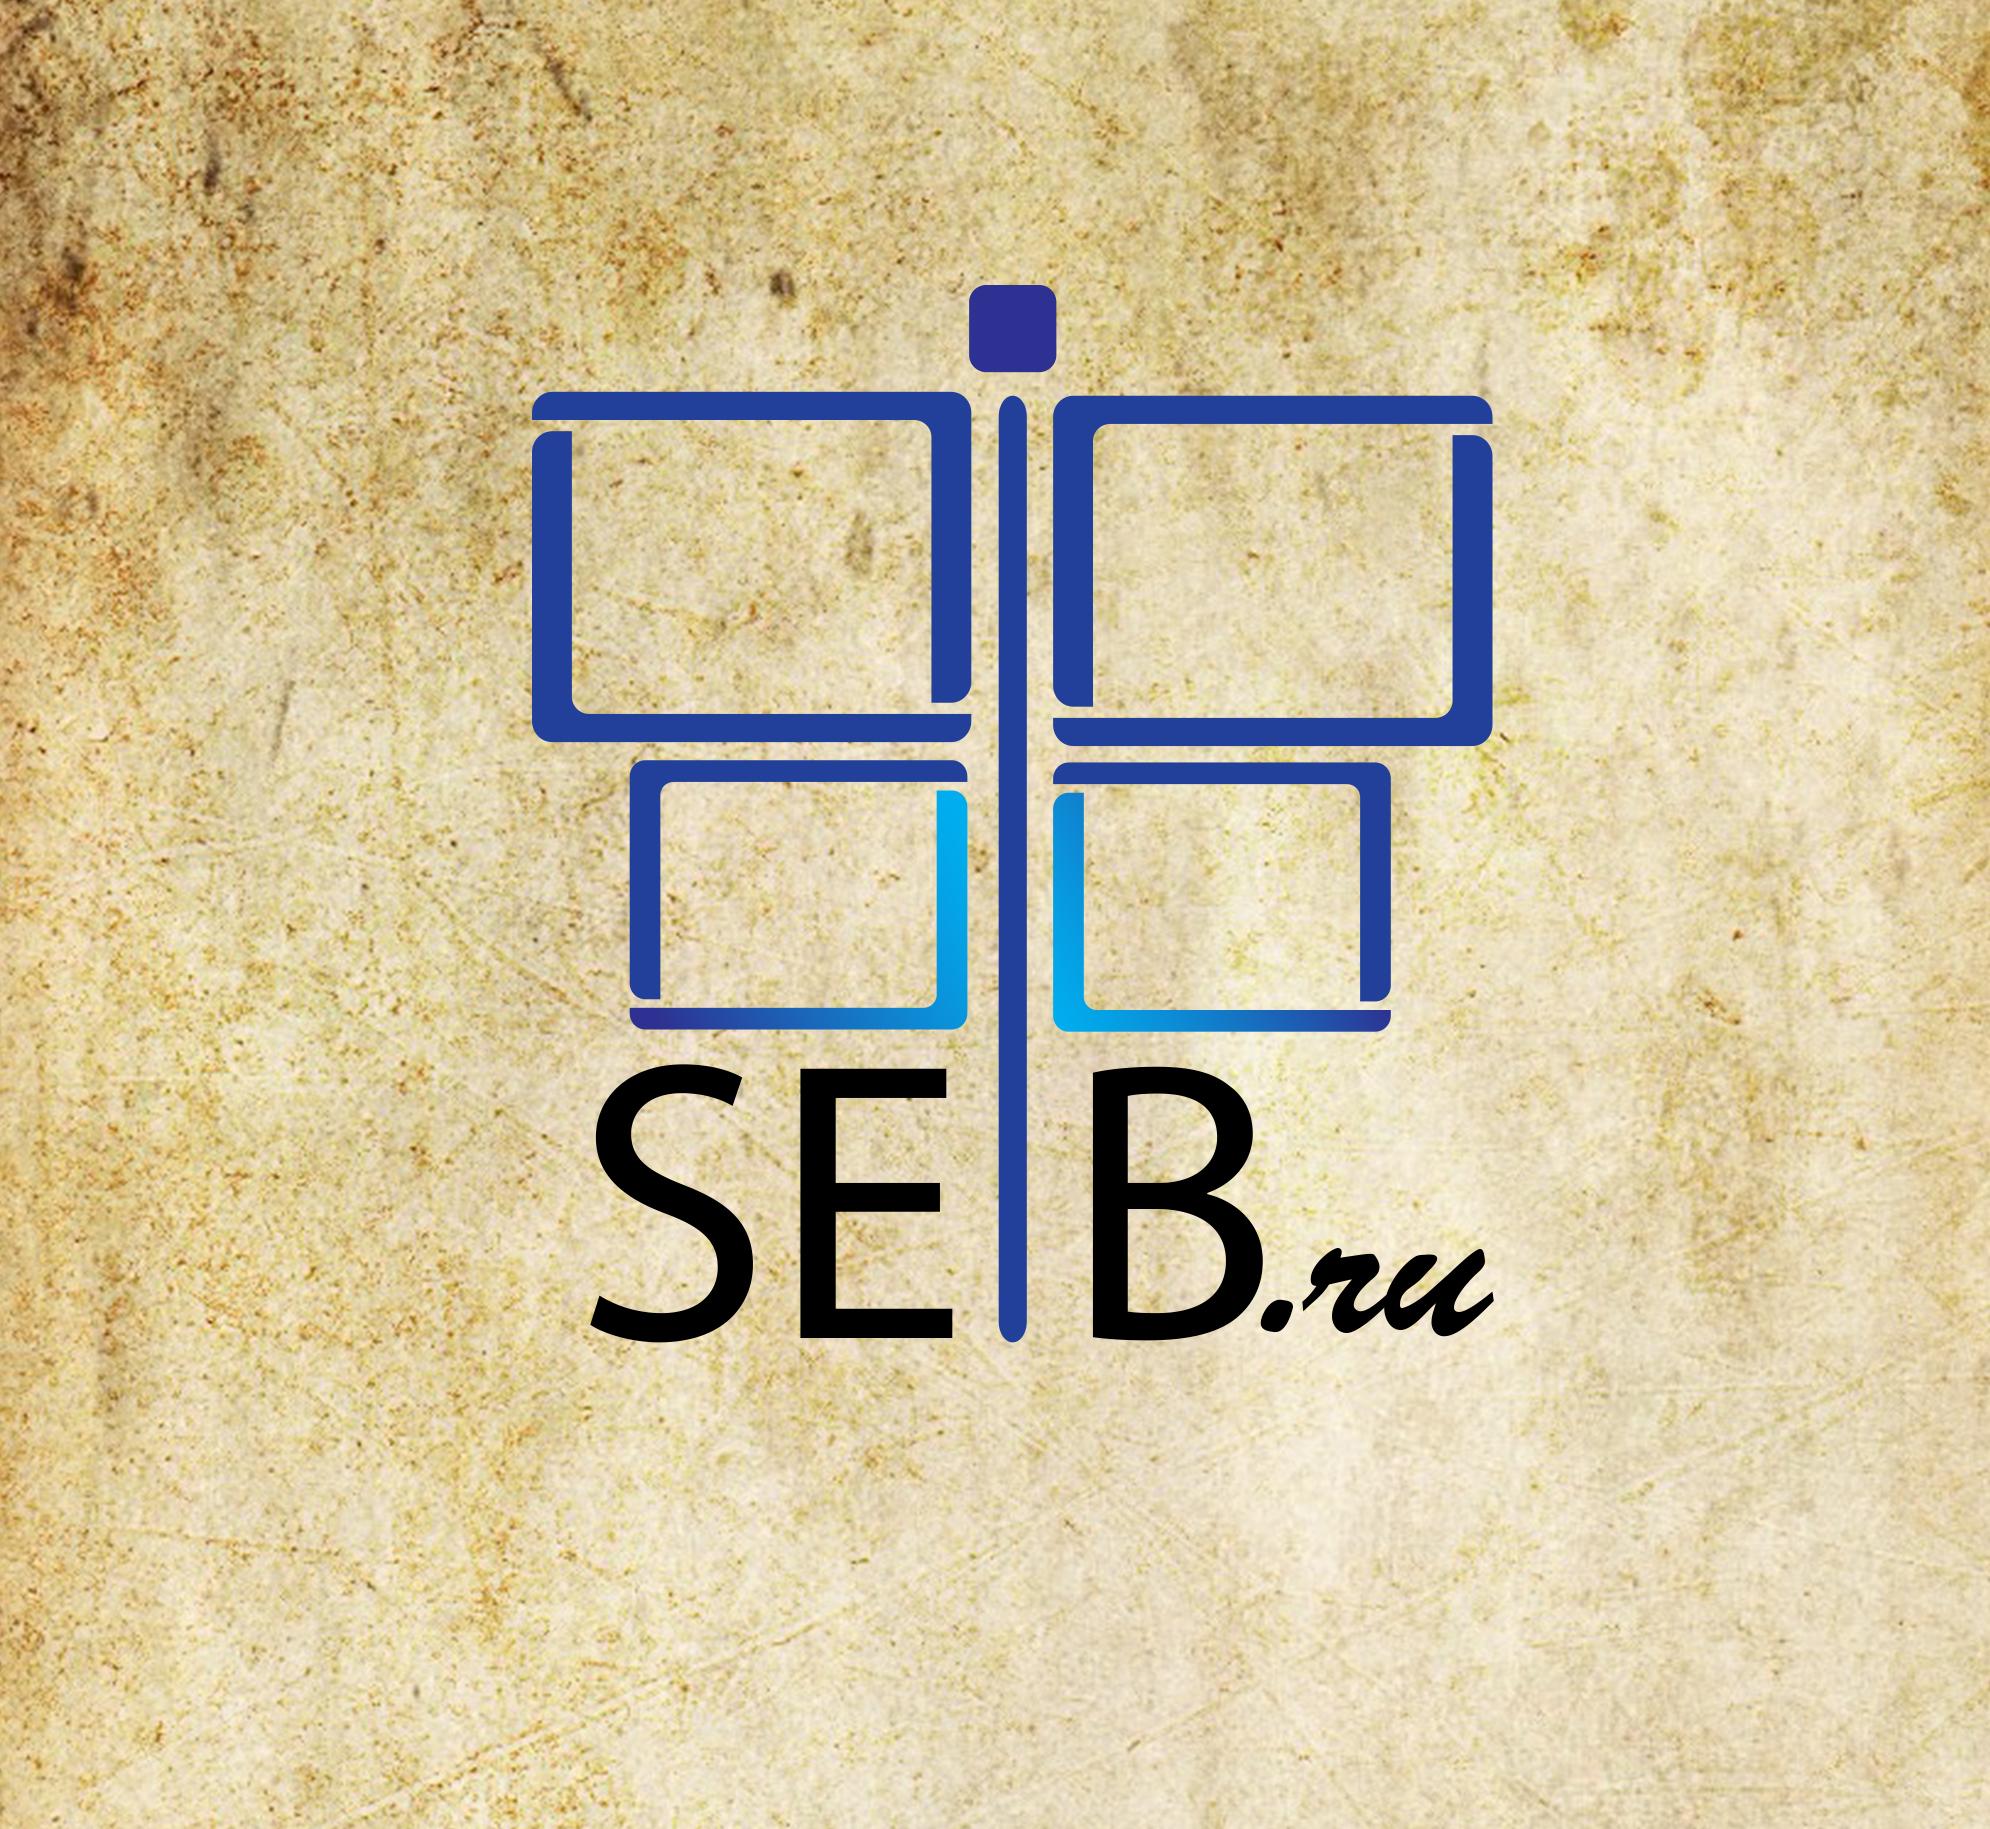 Логотип для инвестиционной компании фото f_2645142db218e298.jpg